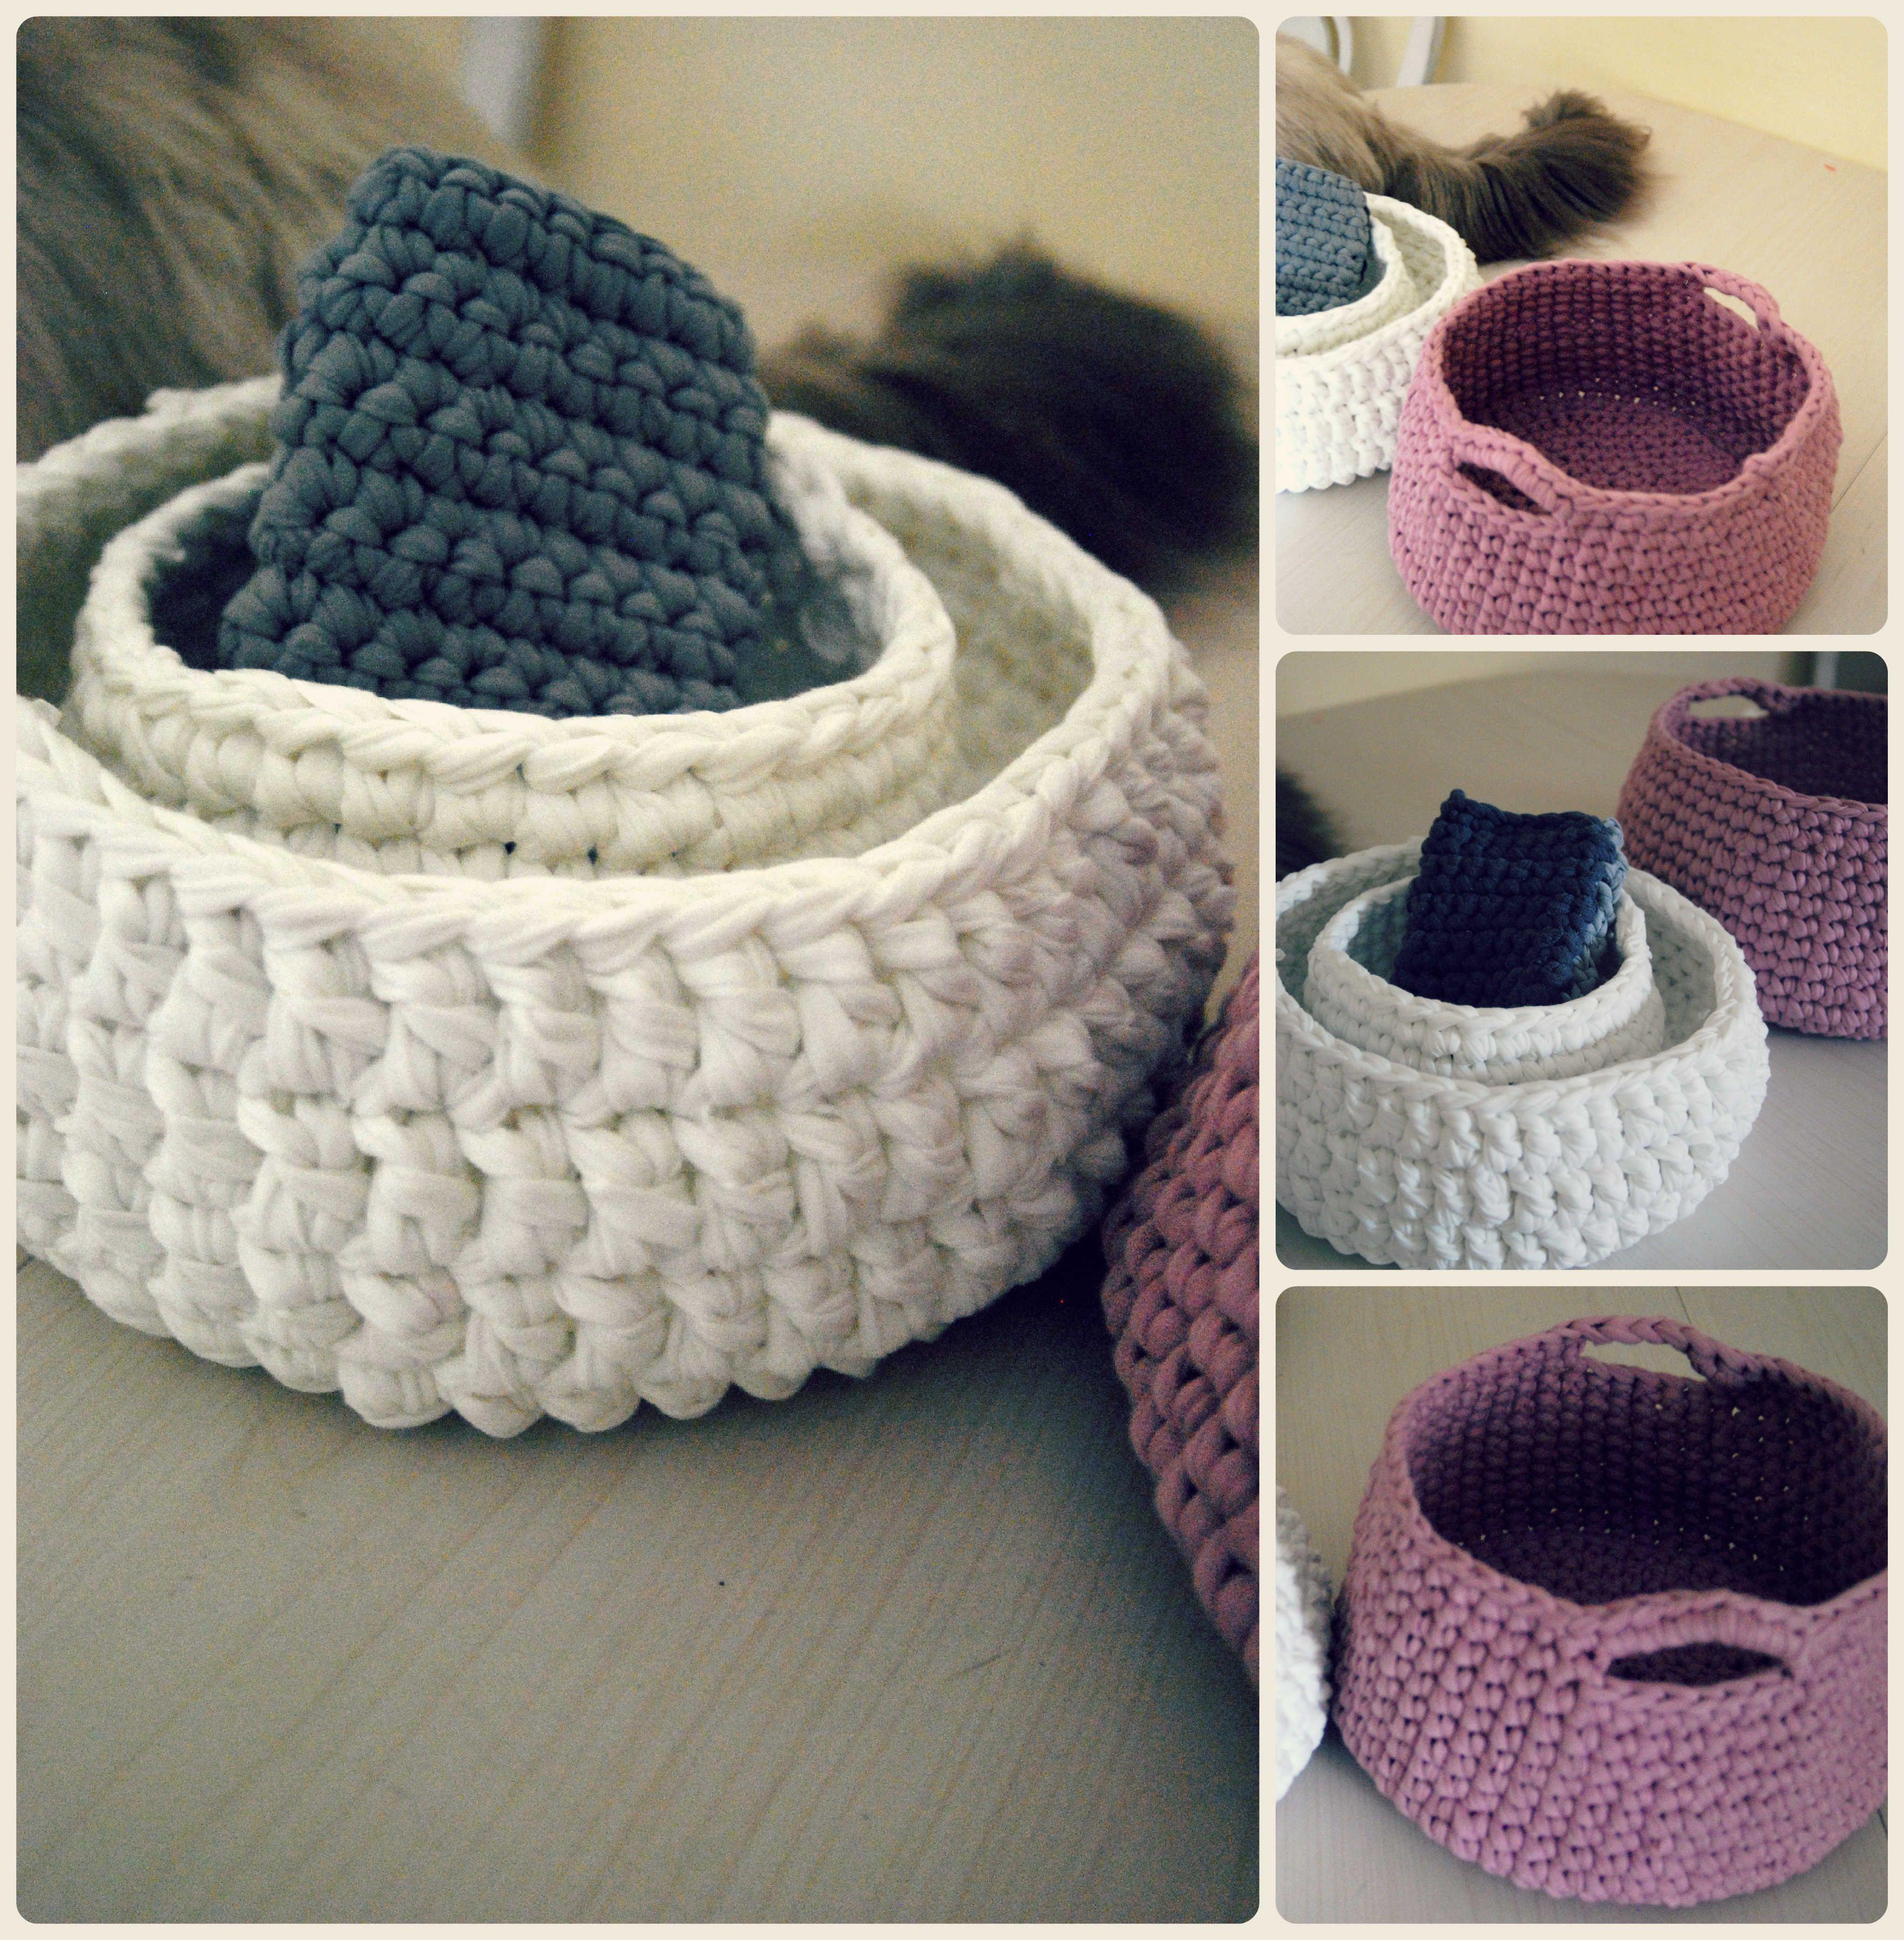 t-shirt yarn crochet baskets and iphone case: //www.etsy.com/il-en ...